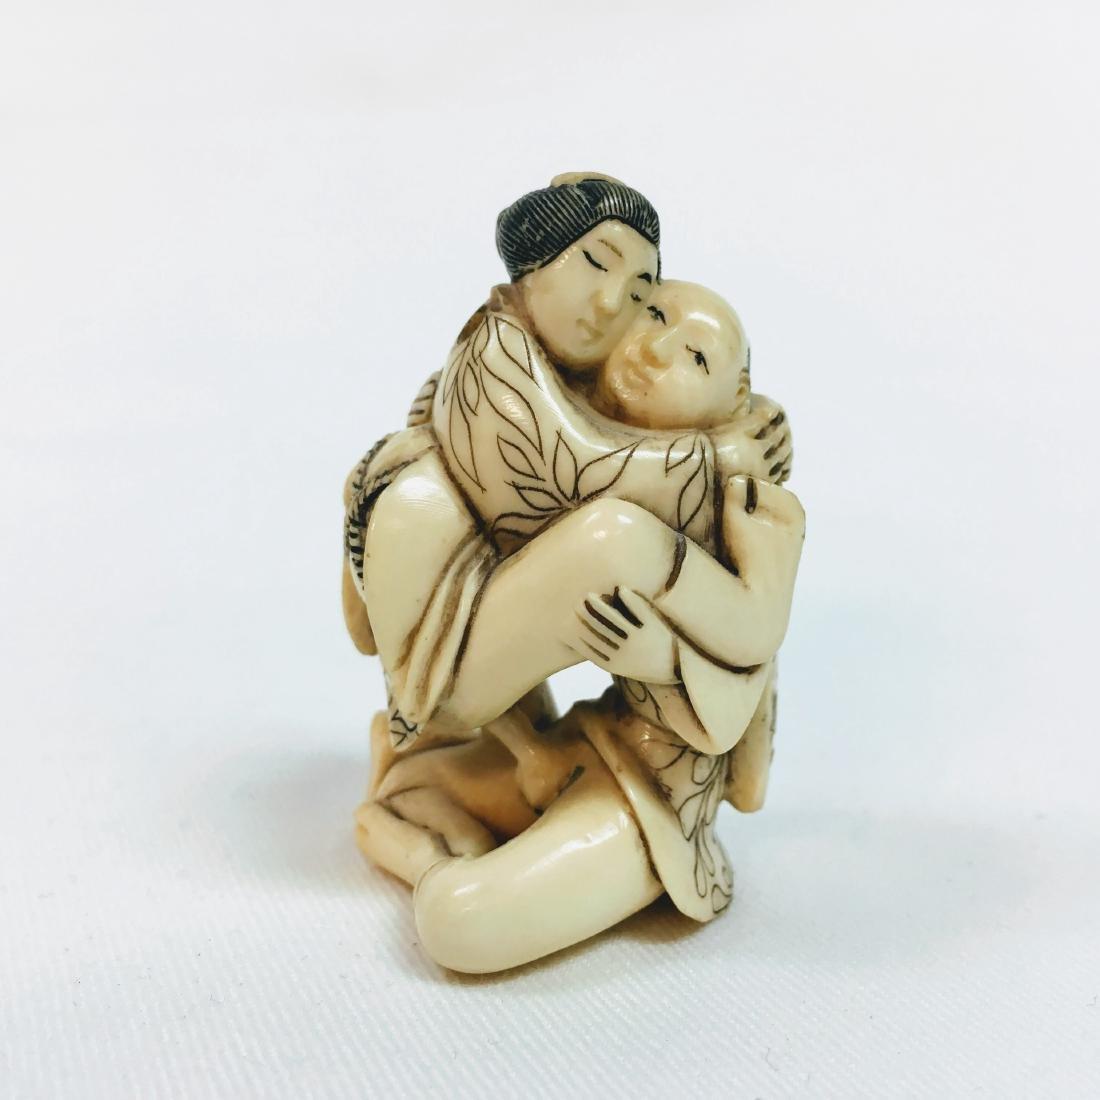 19th Century Erotic Netsuke man with woman figure - 6